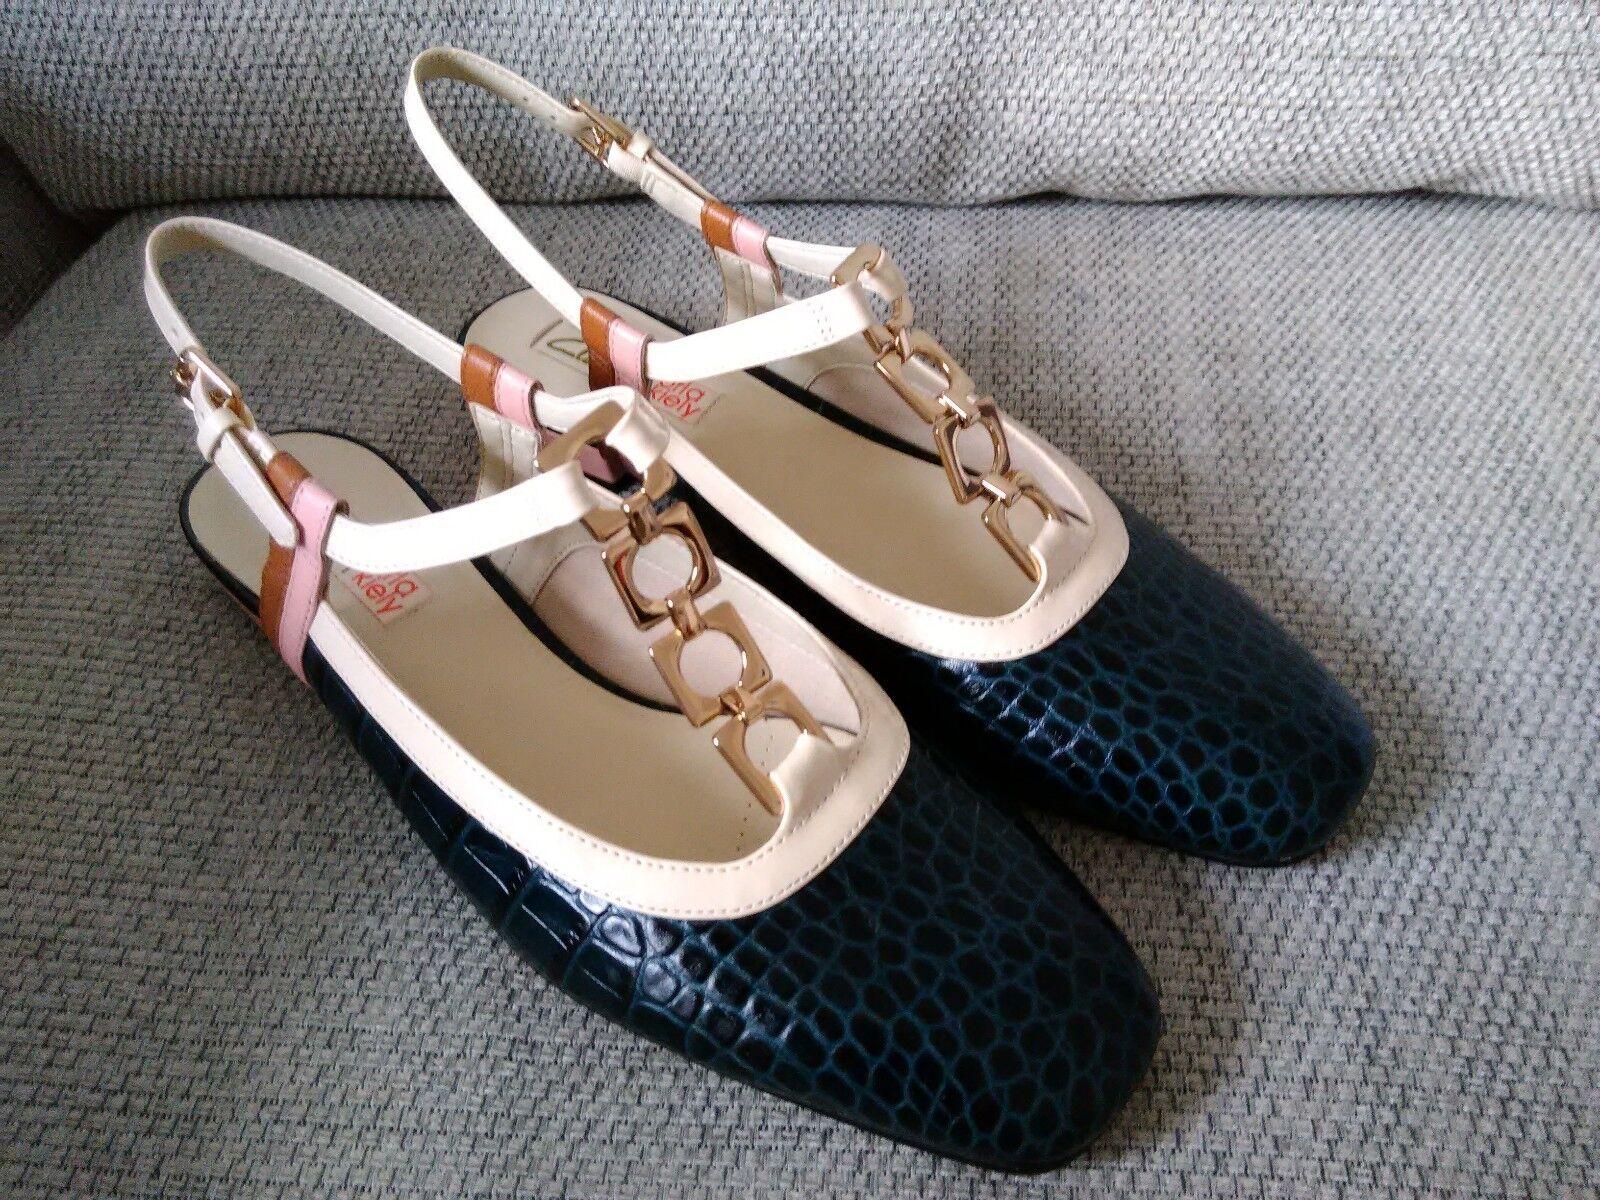 Orla Kiely Clark's, Barbara Blu Navy Scarpe Di Pelle, Regno Unito misura 5.5, EUR 39 vintage